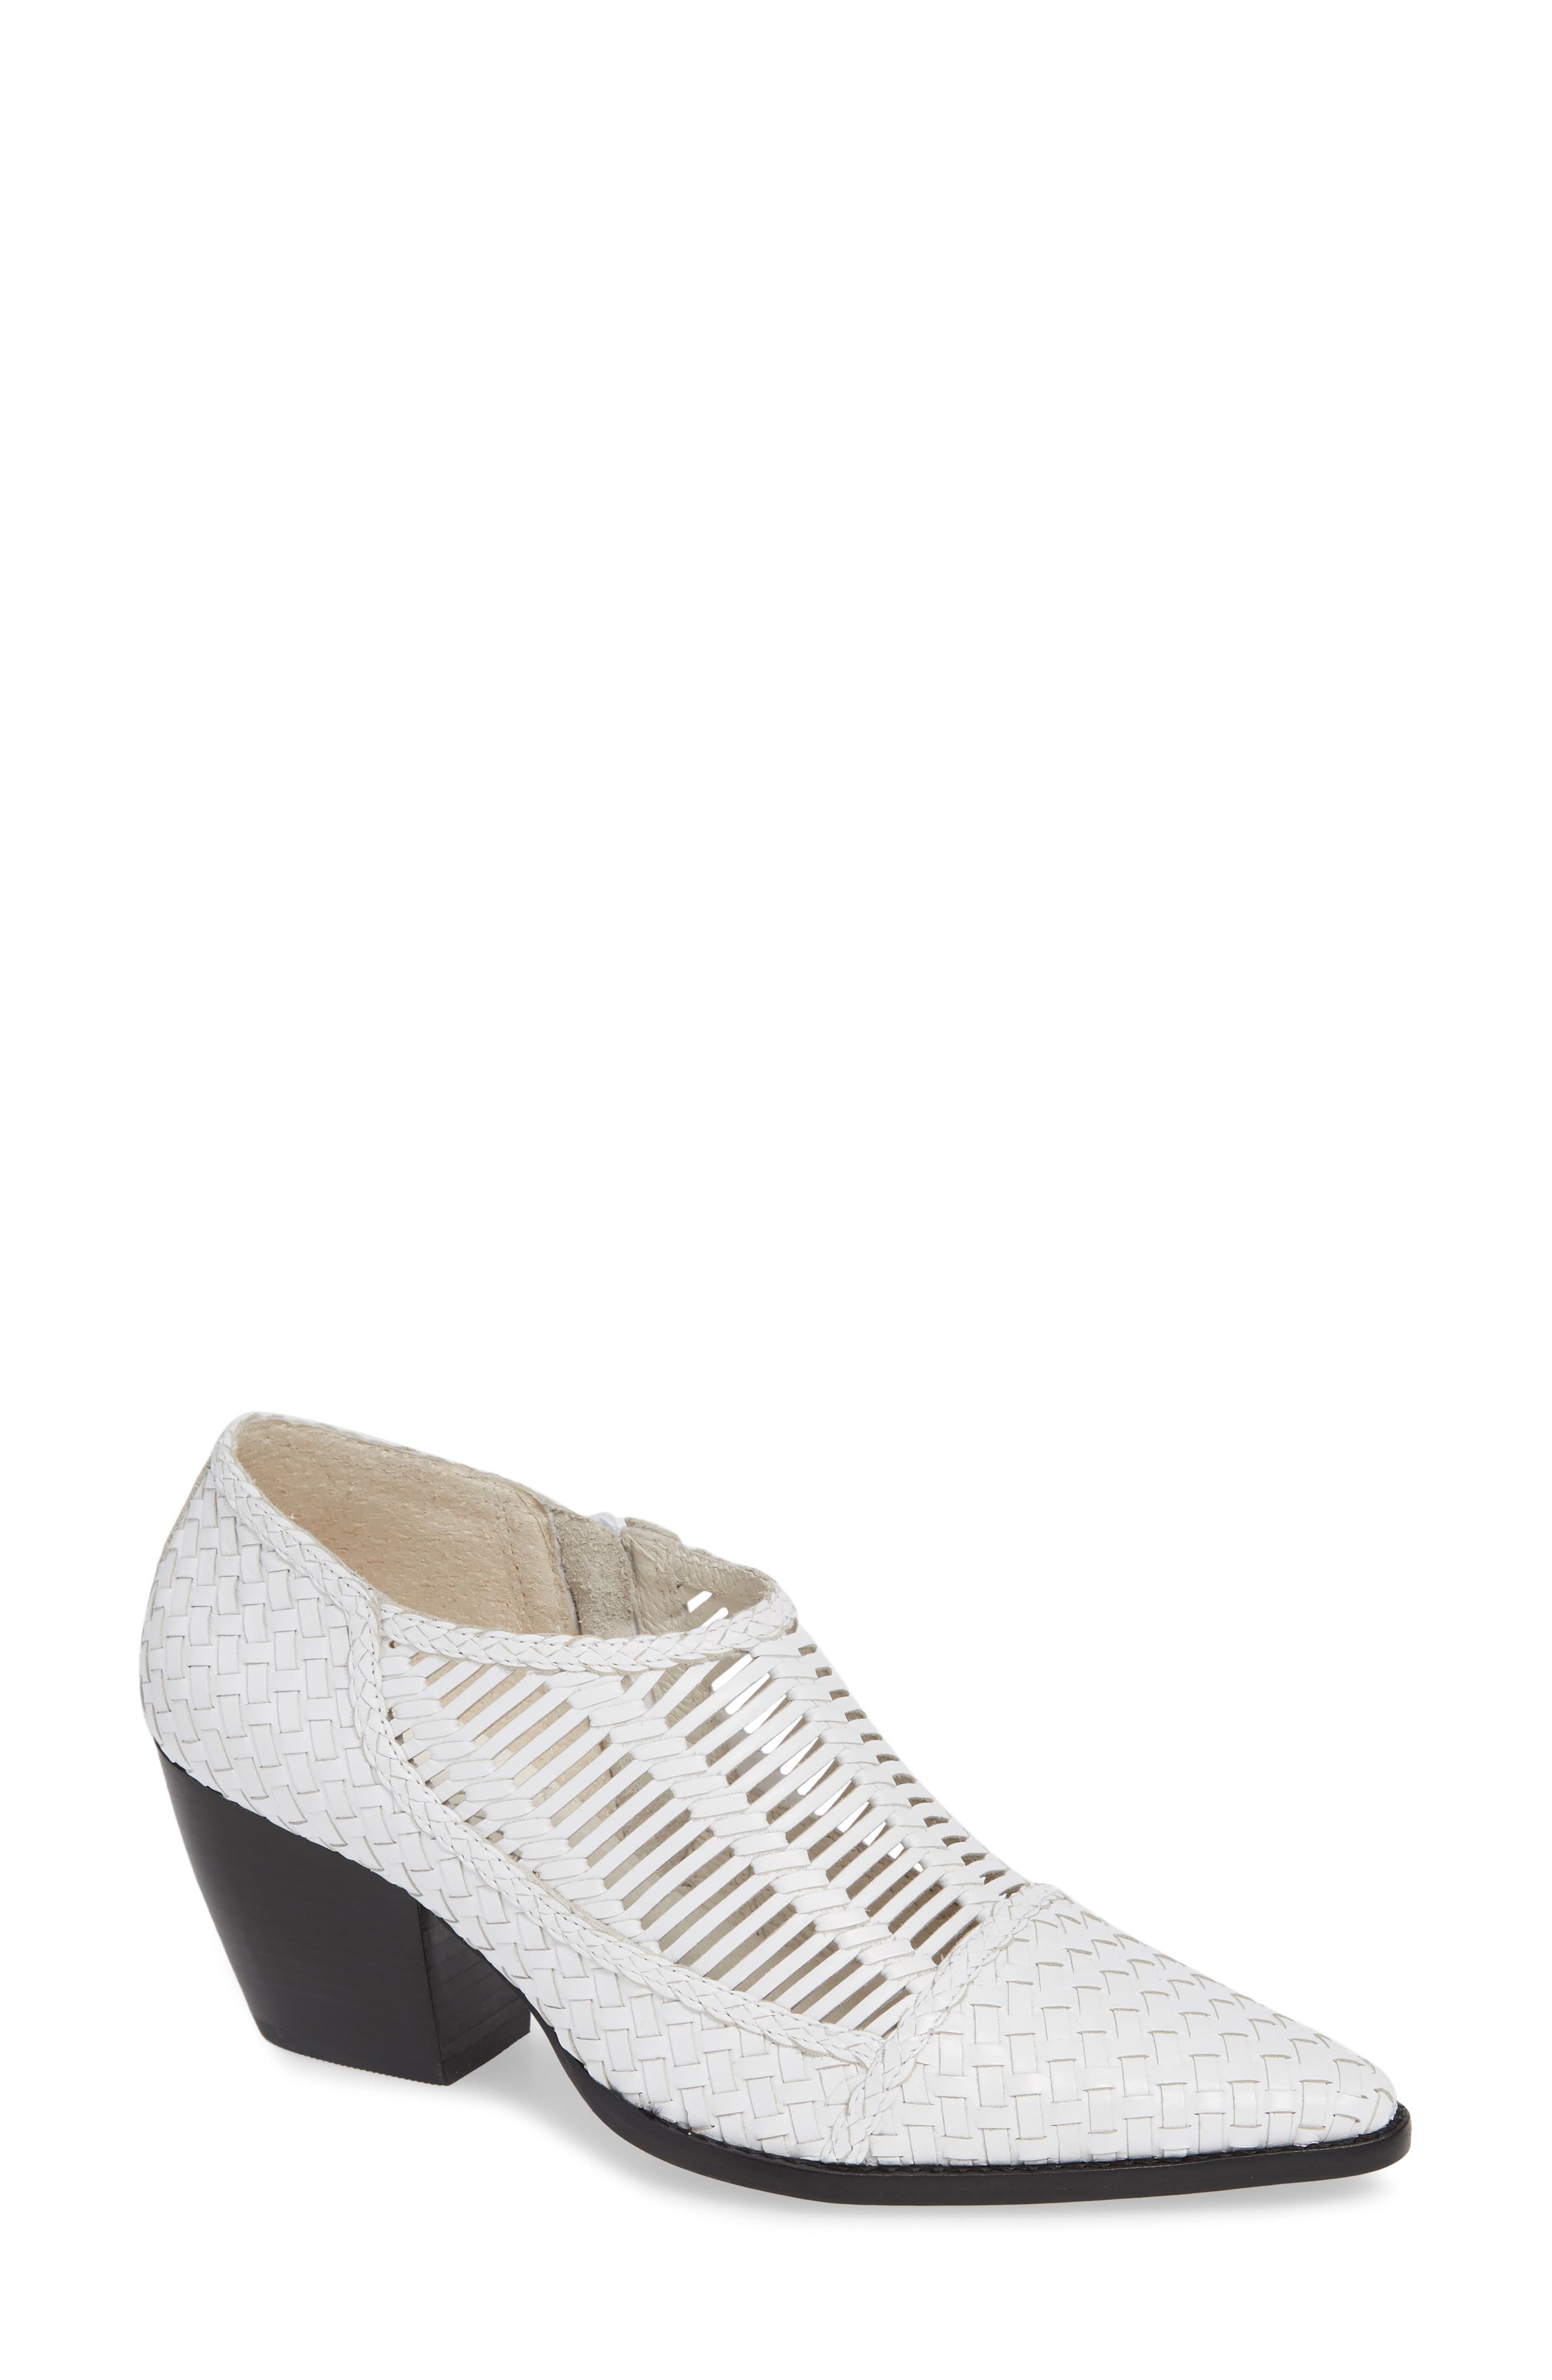 Matisse Vigo Woven Bootie, White